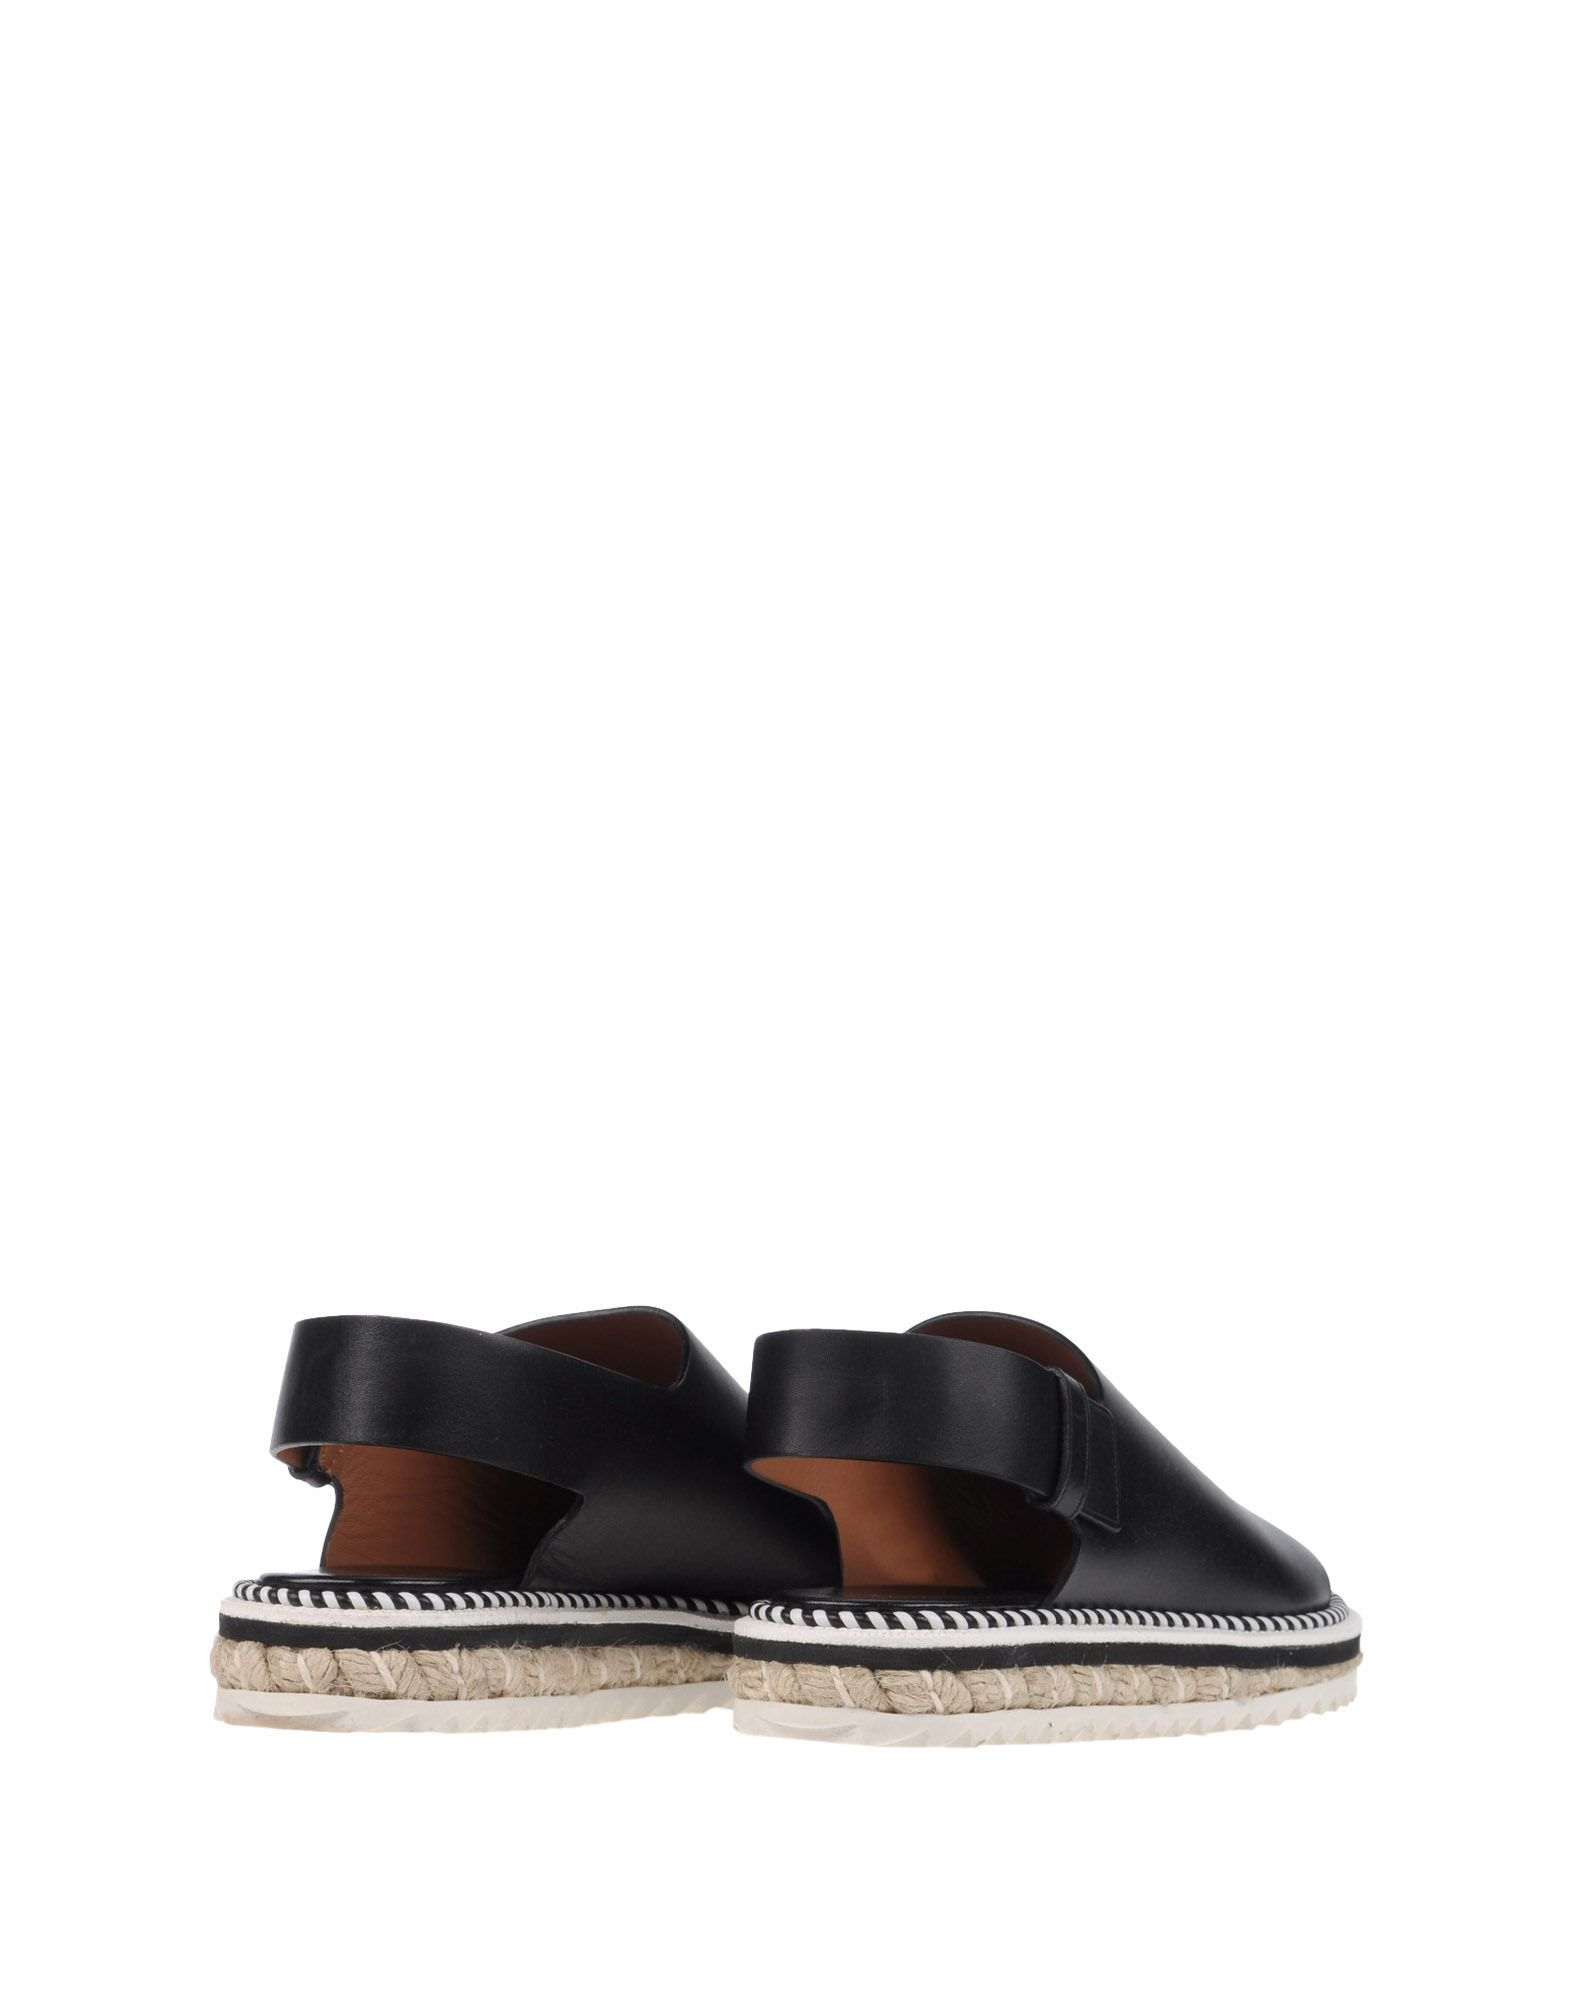 Givenchy gut Espadrilles Damen  11200758LRGünstige gut Givenchy aussehende Schuhe 136ec2